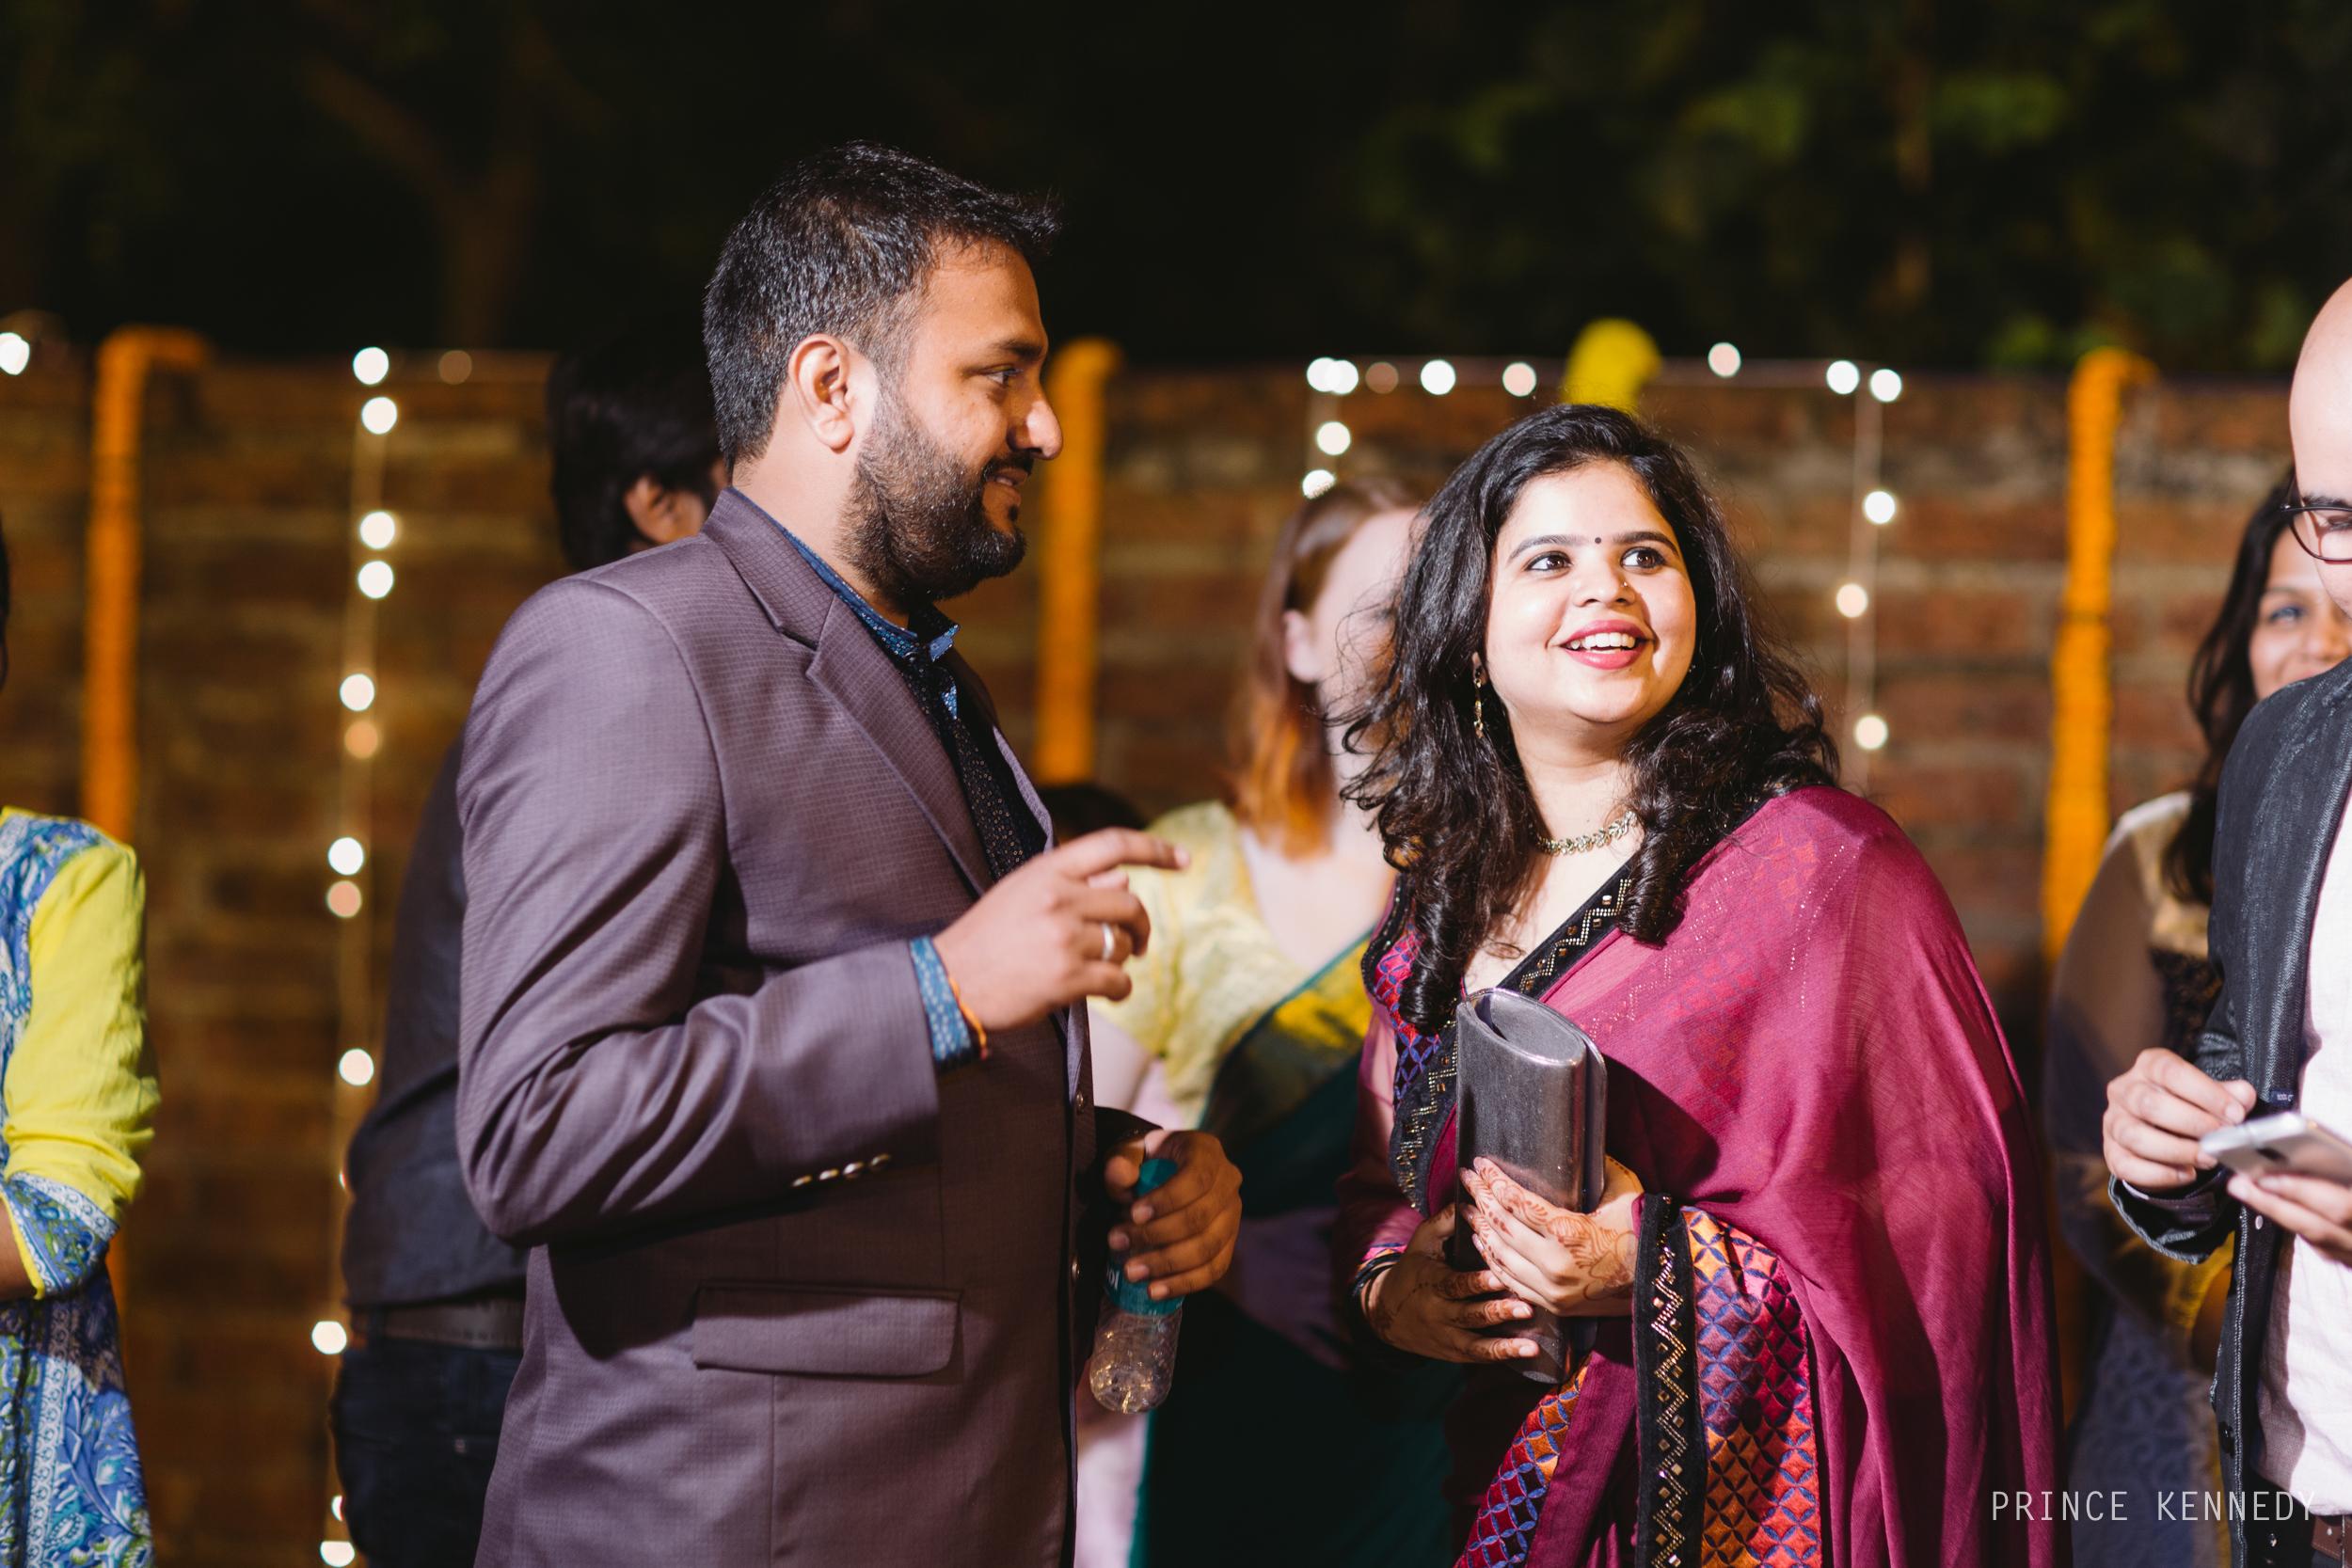 Athmajja-Nithesh-Engagement-Couple-Portrait-Portraiture-Wedding-Couple-Portrait-Chennai-Photographer-Candid-Photography-Destination-Best-Prince-Kennedy-Photography-128.jpg